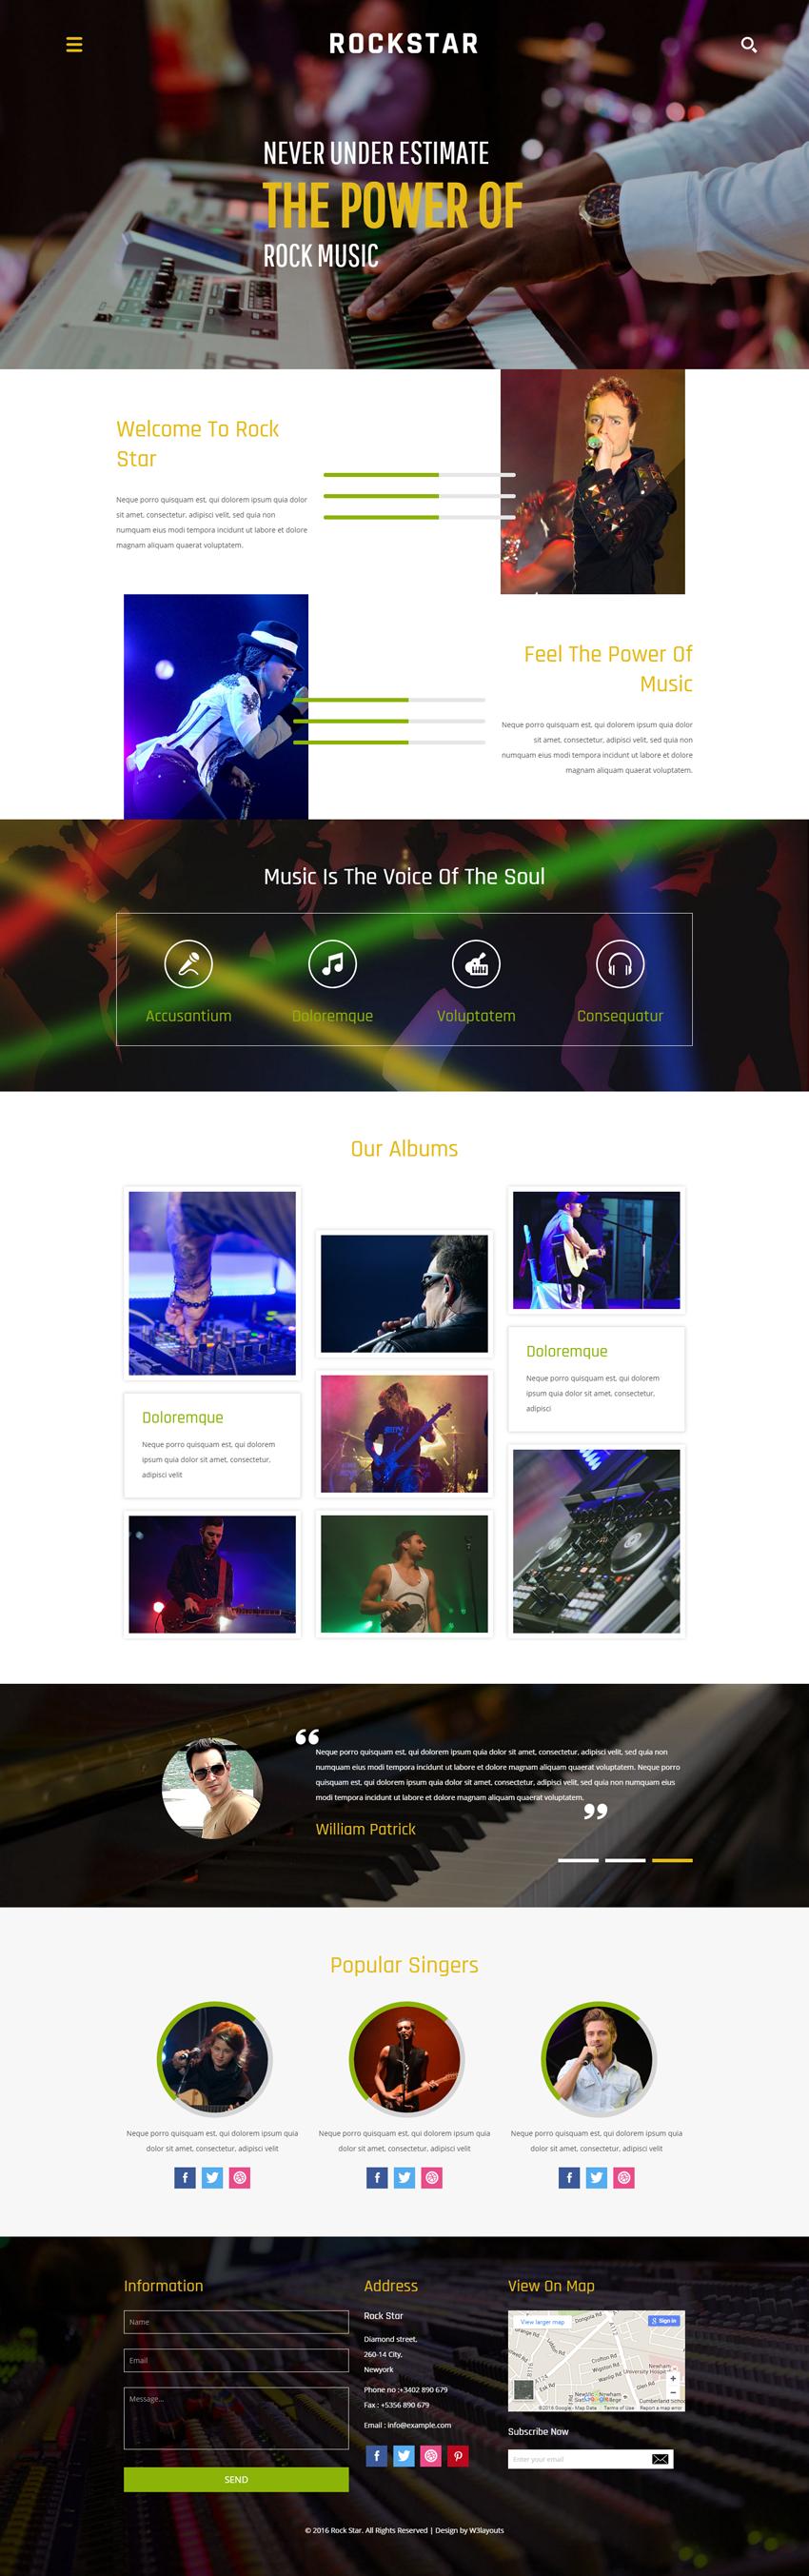 rock_star-web-full